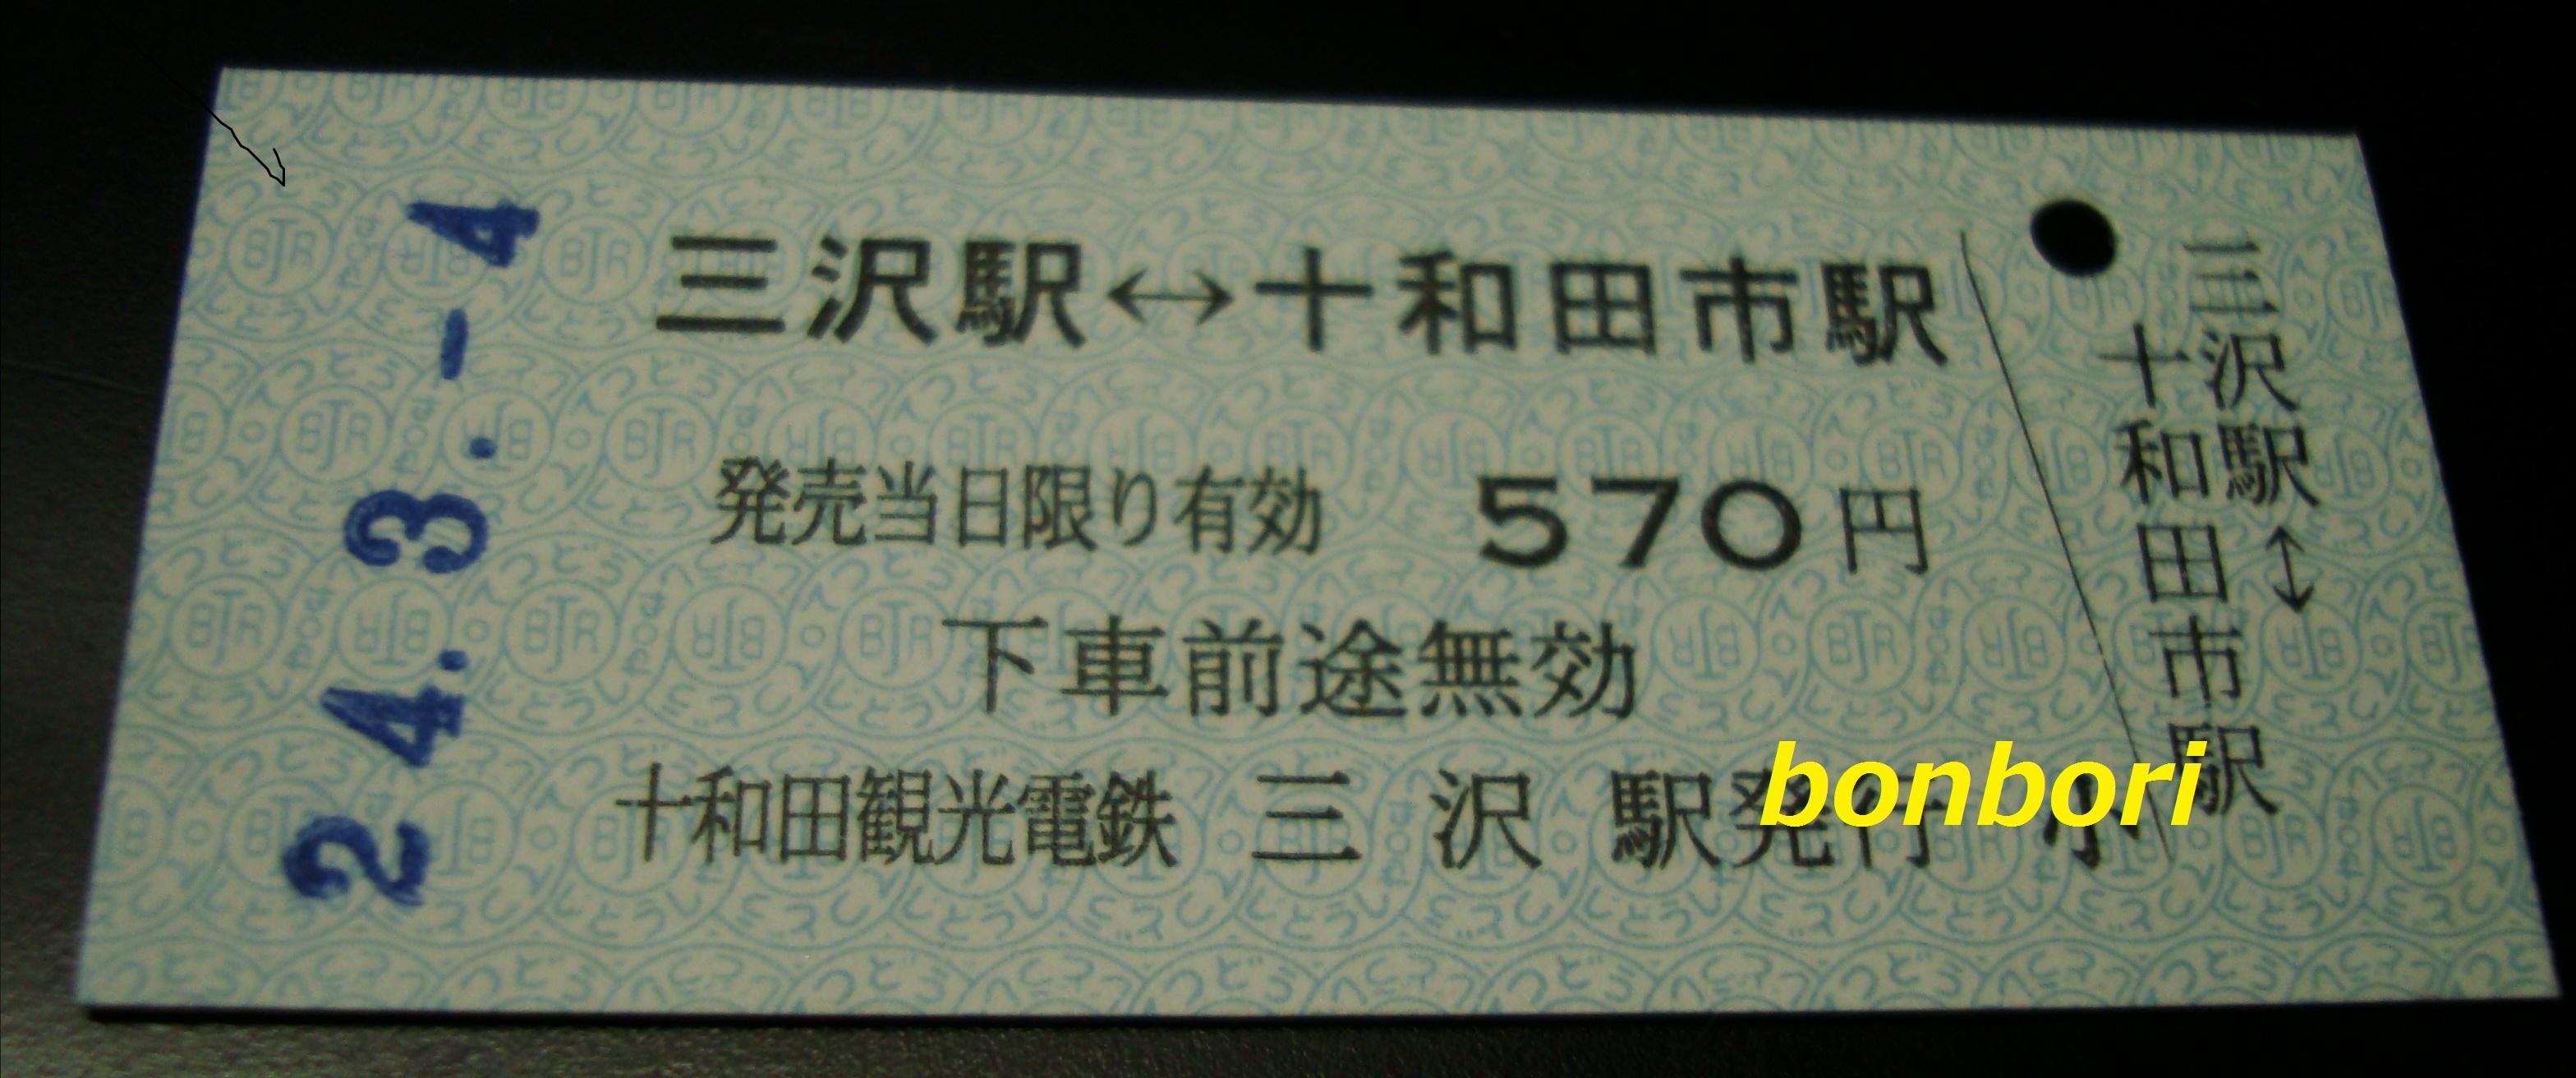 DSC03185.JPG